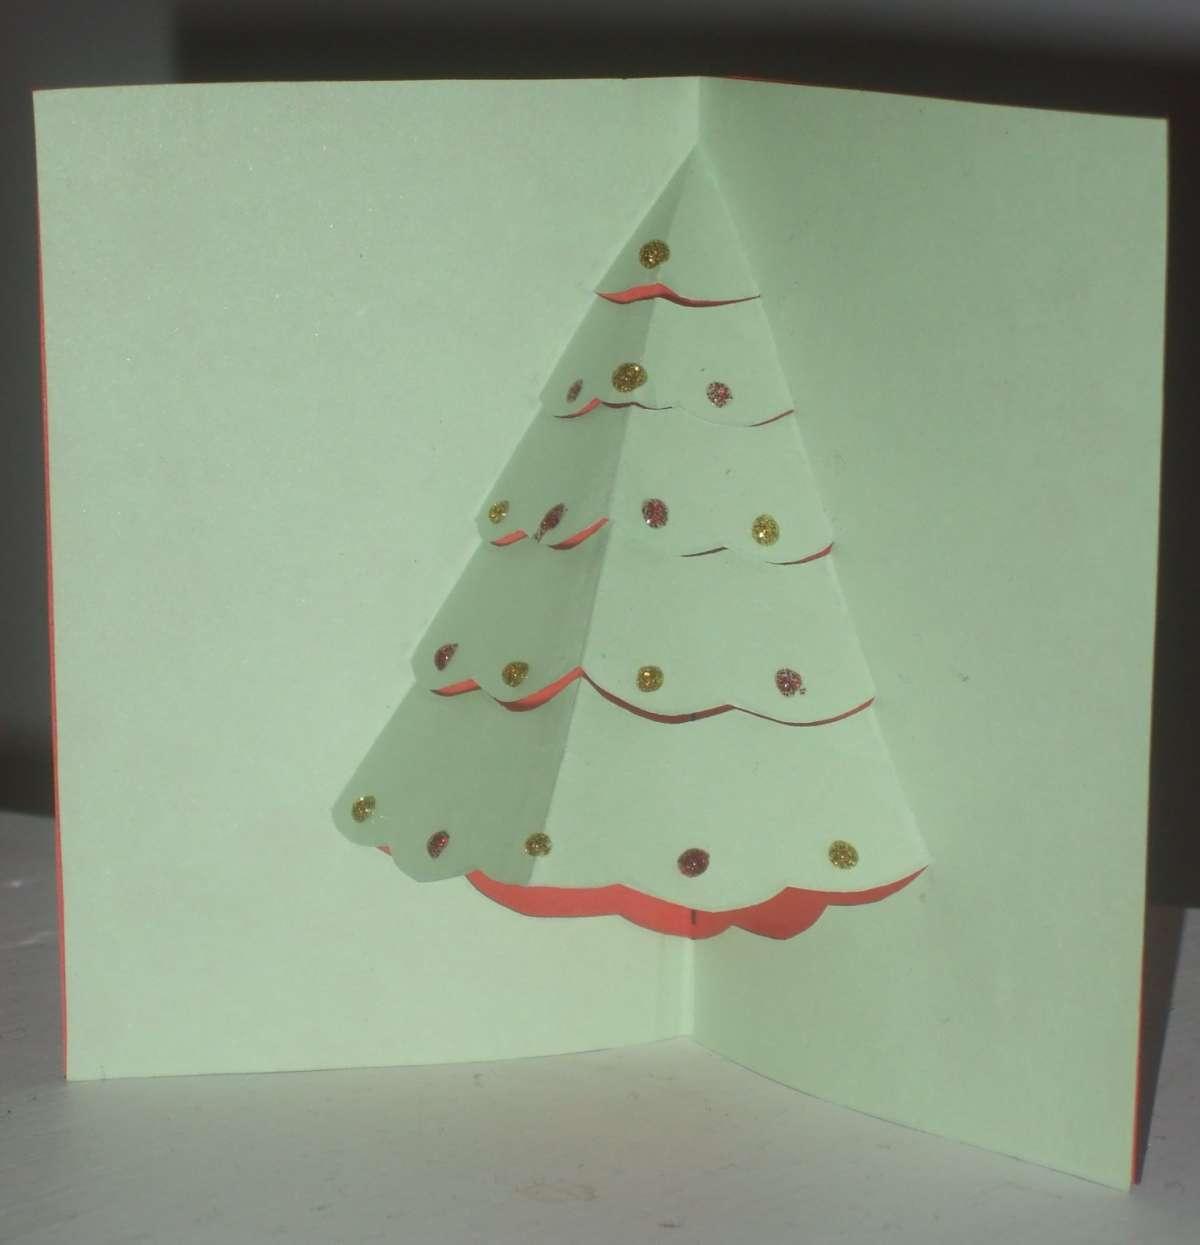 Biglietti pop up di Natale fai da te: albero